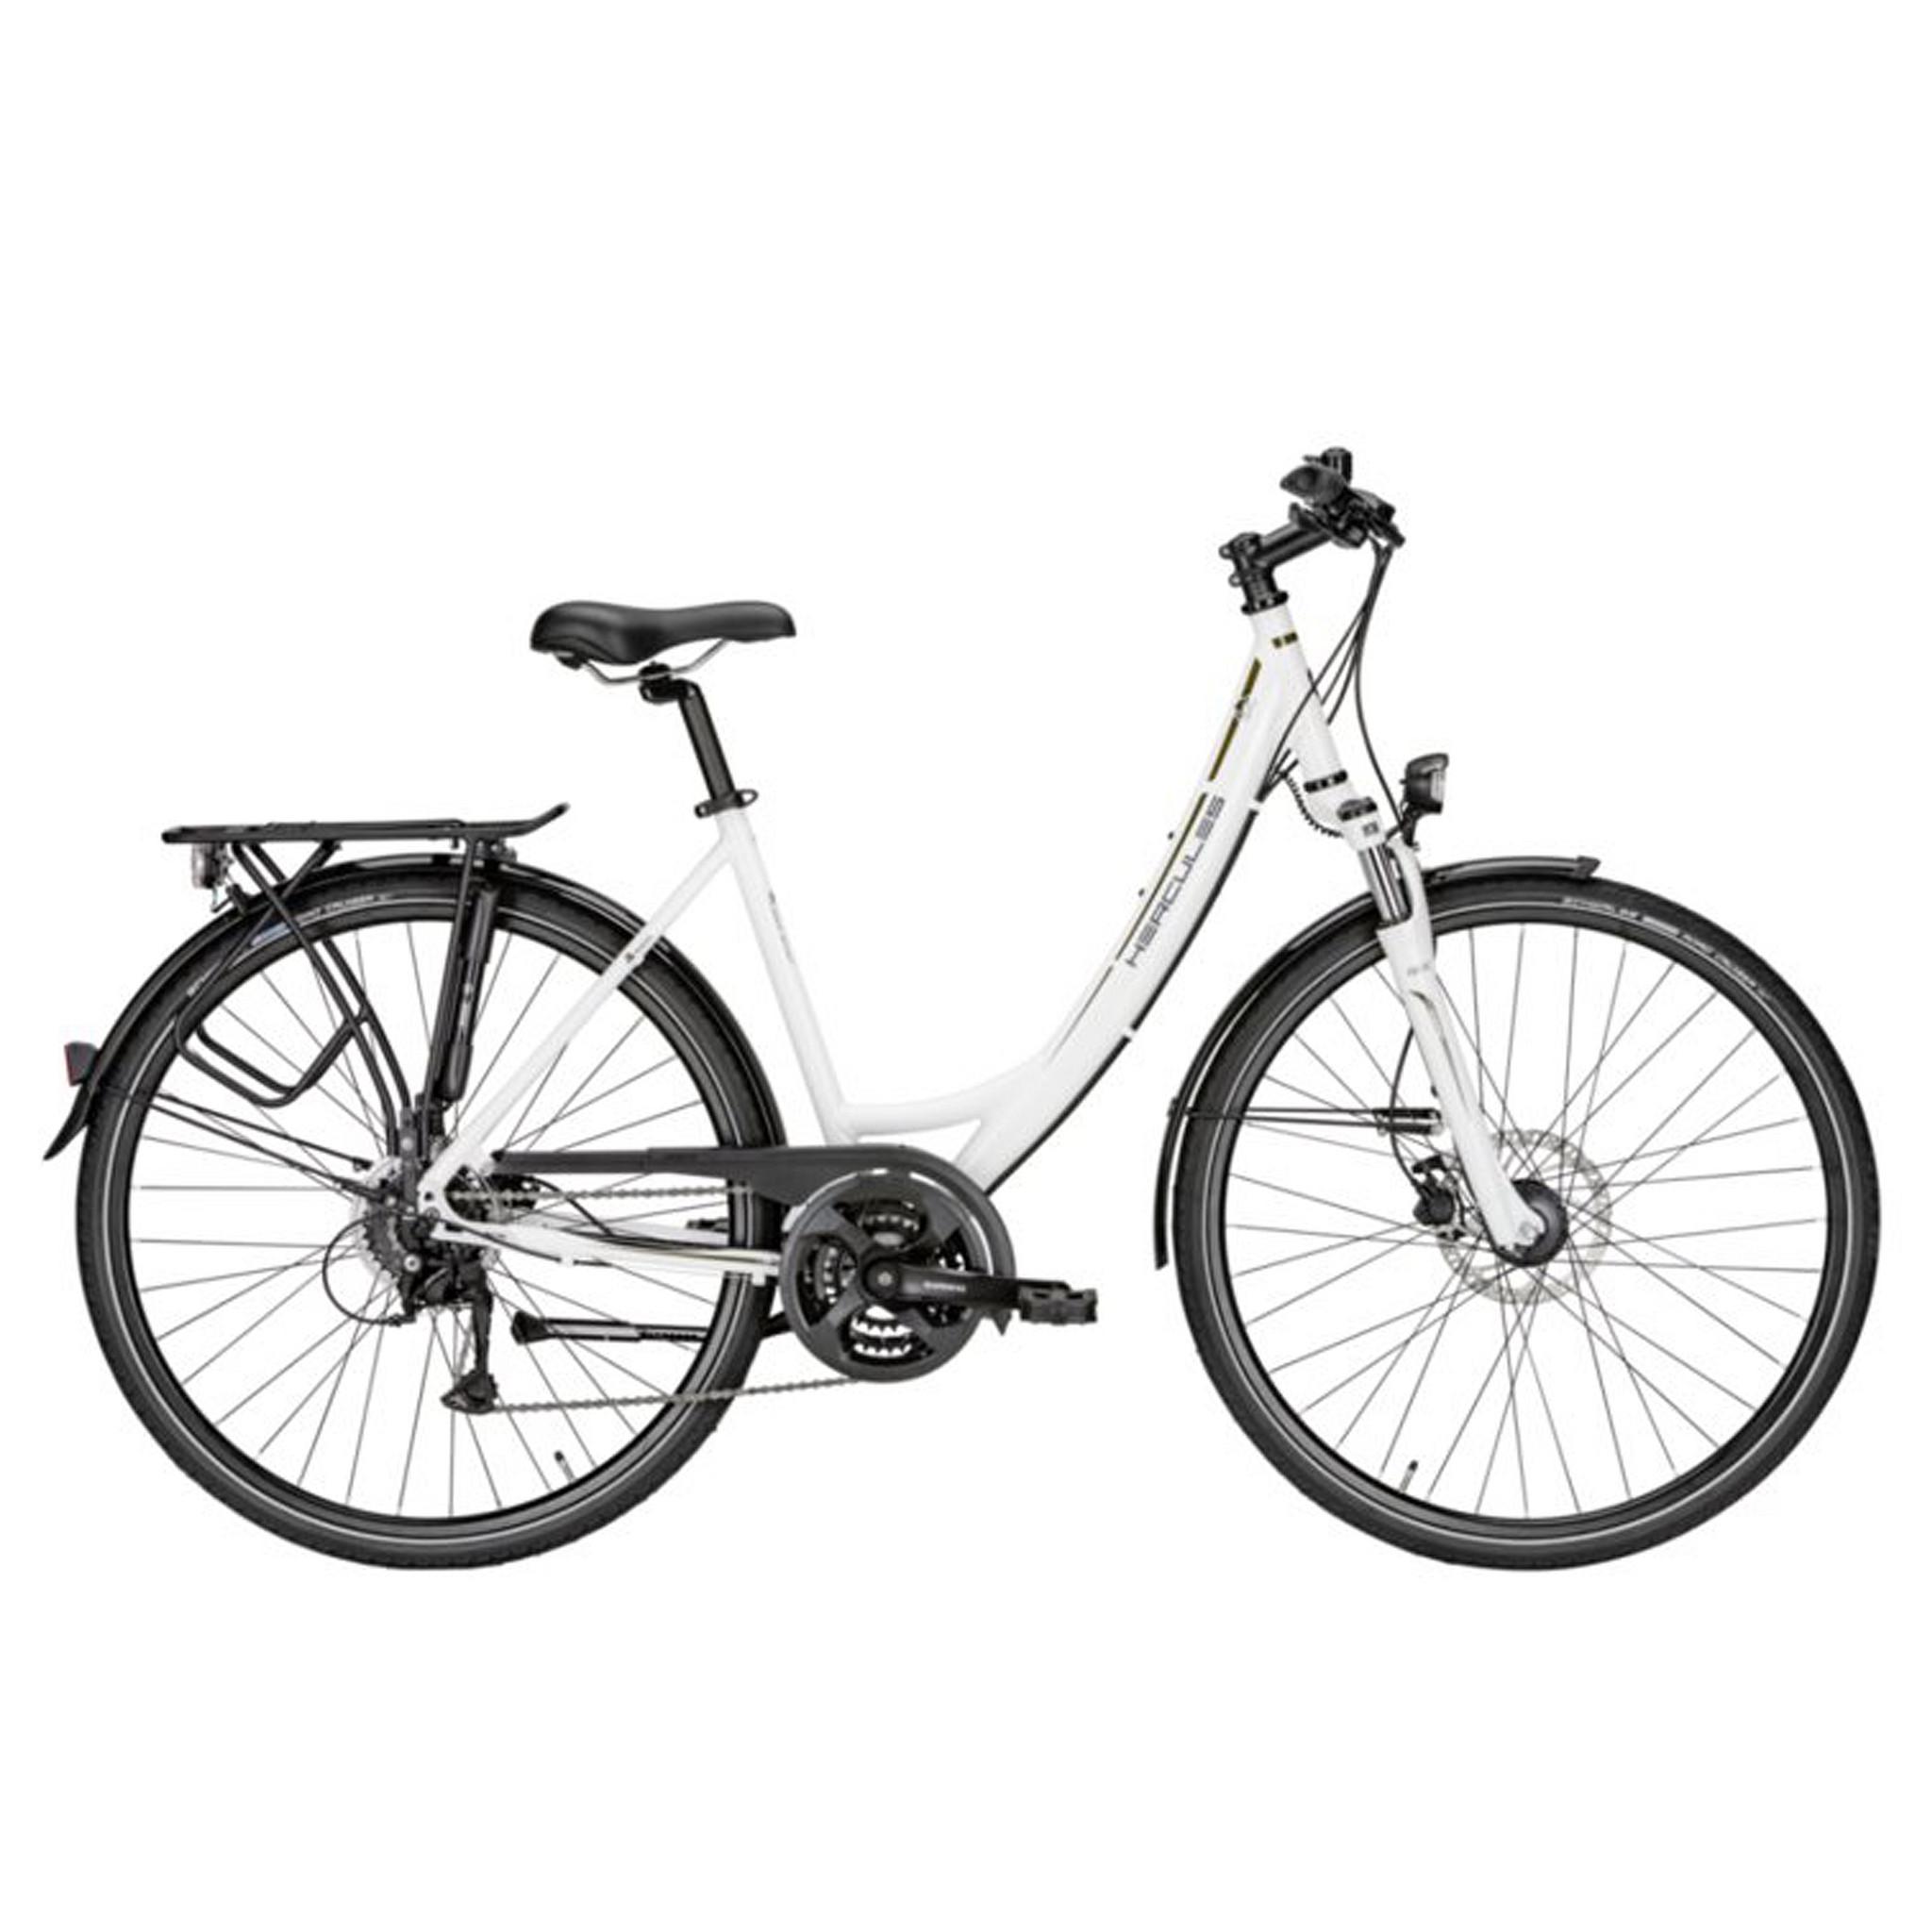 Hercules Sportieve fiets Tourer 24 Sport dames wit 45cm Wit